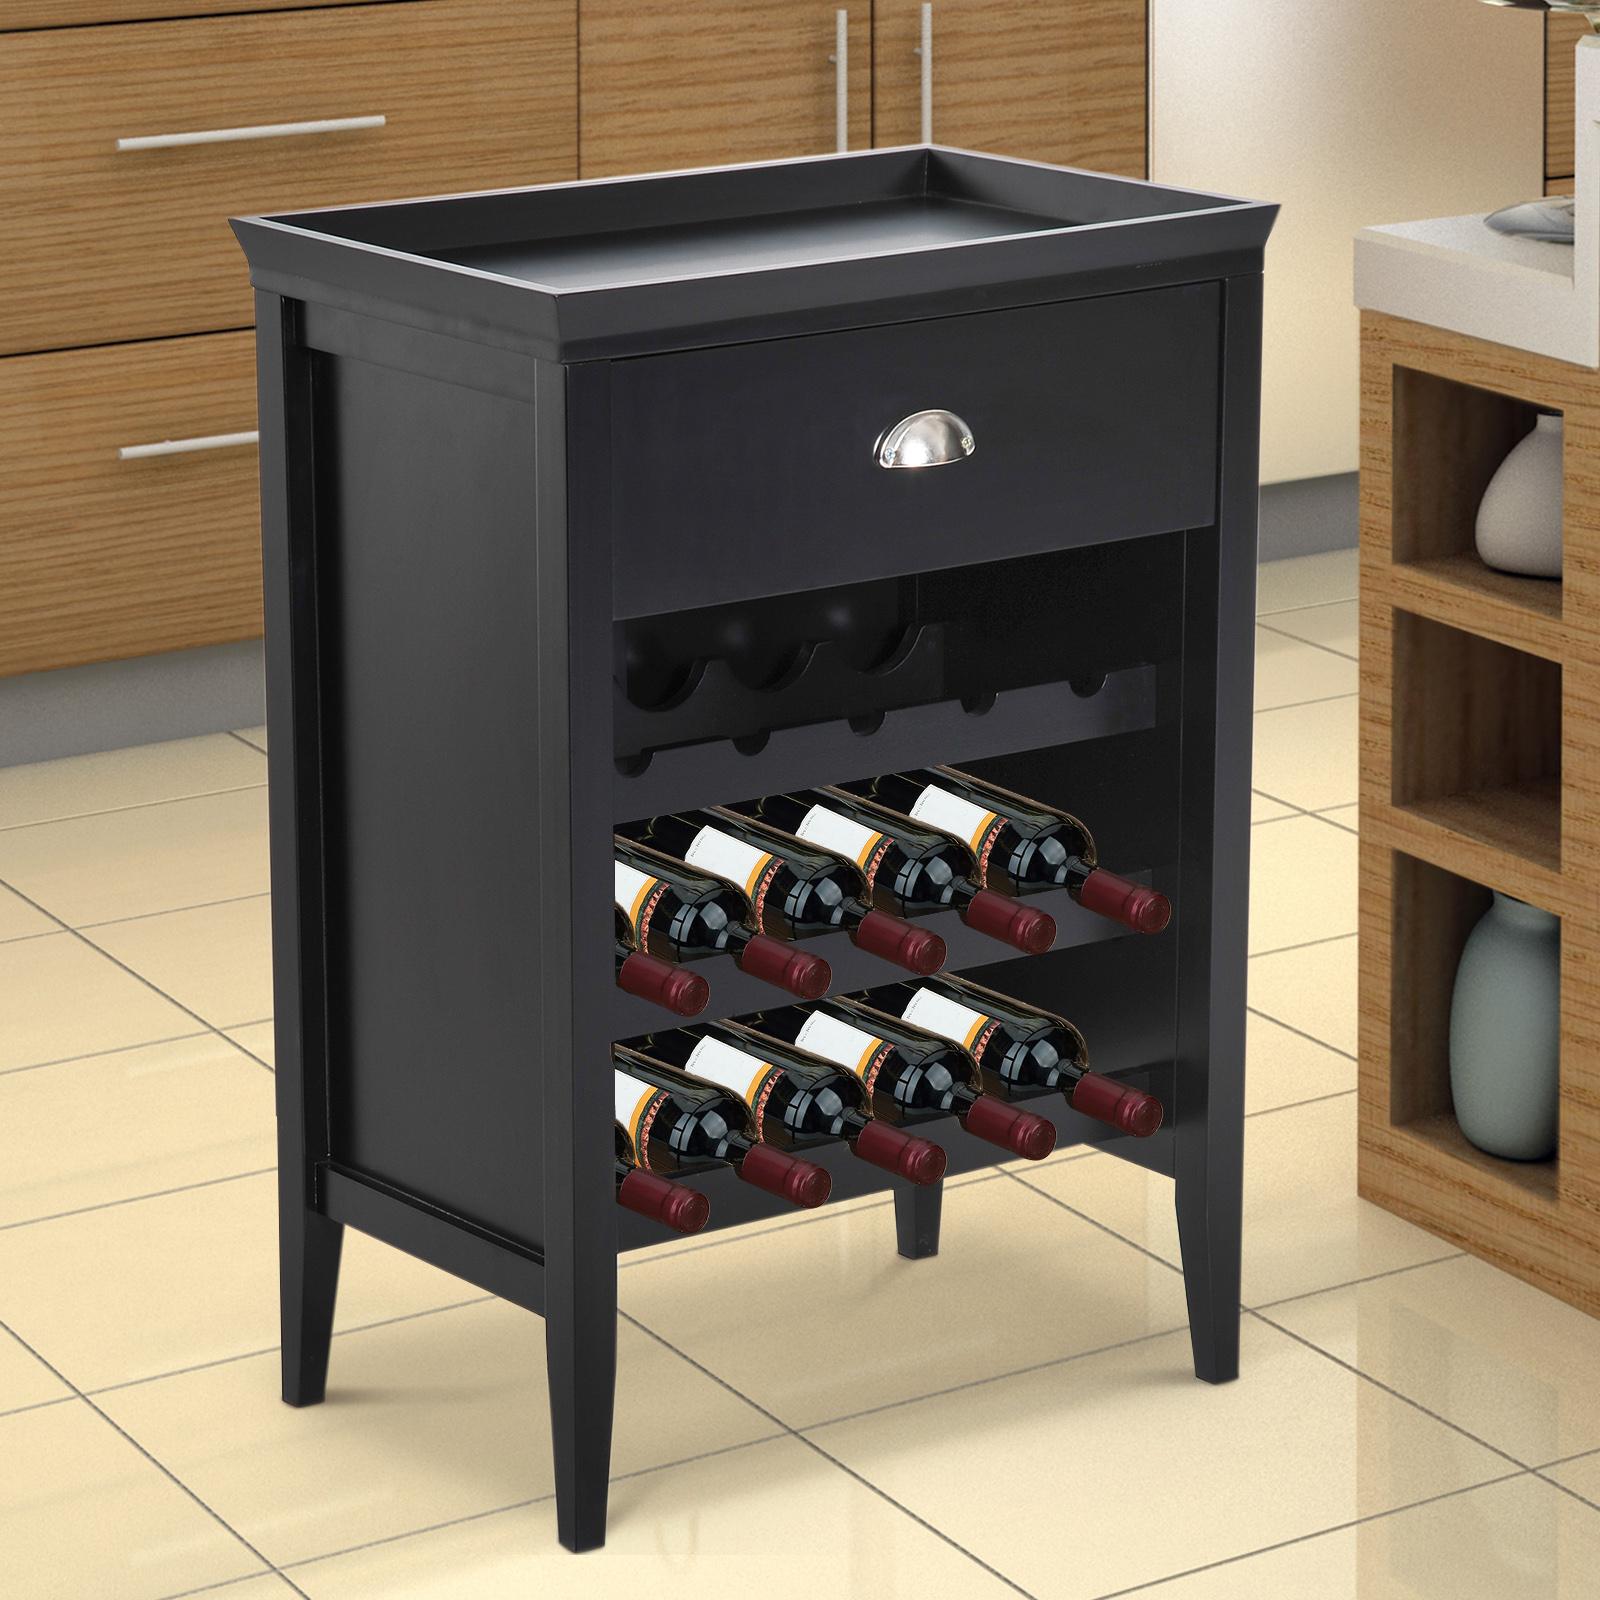 Charmant Details About 15 Bottle Wood Wine Rack Cabinet Holder Organizer Home Bar  Display W/ Drawer